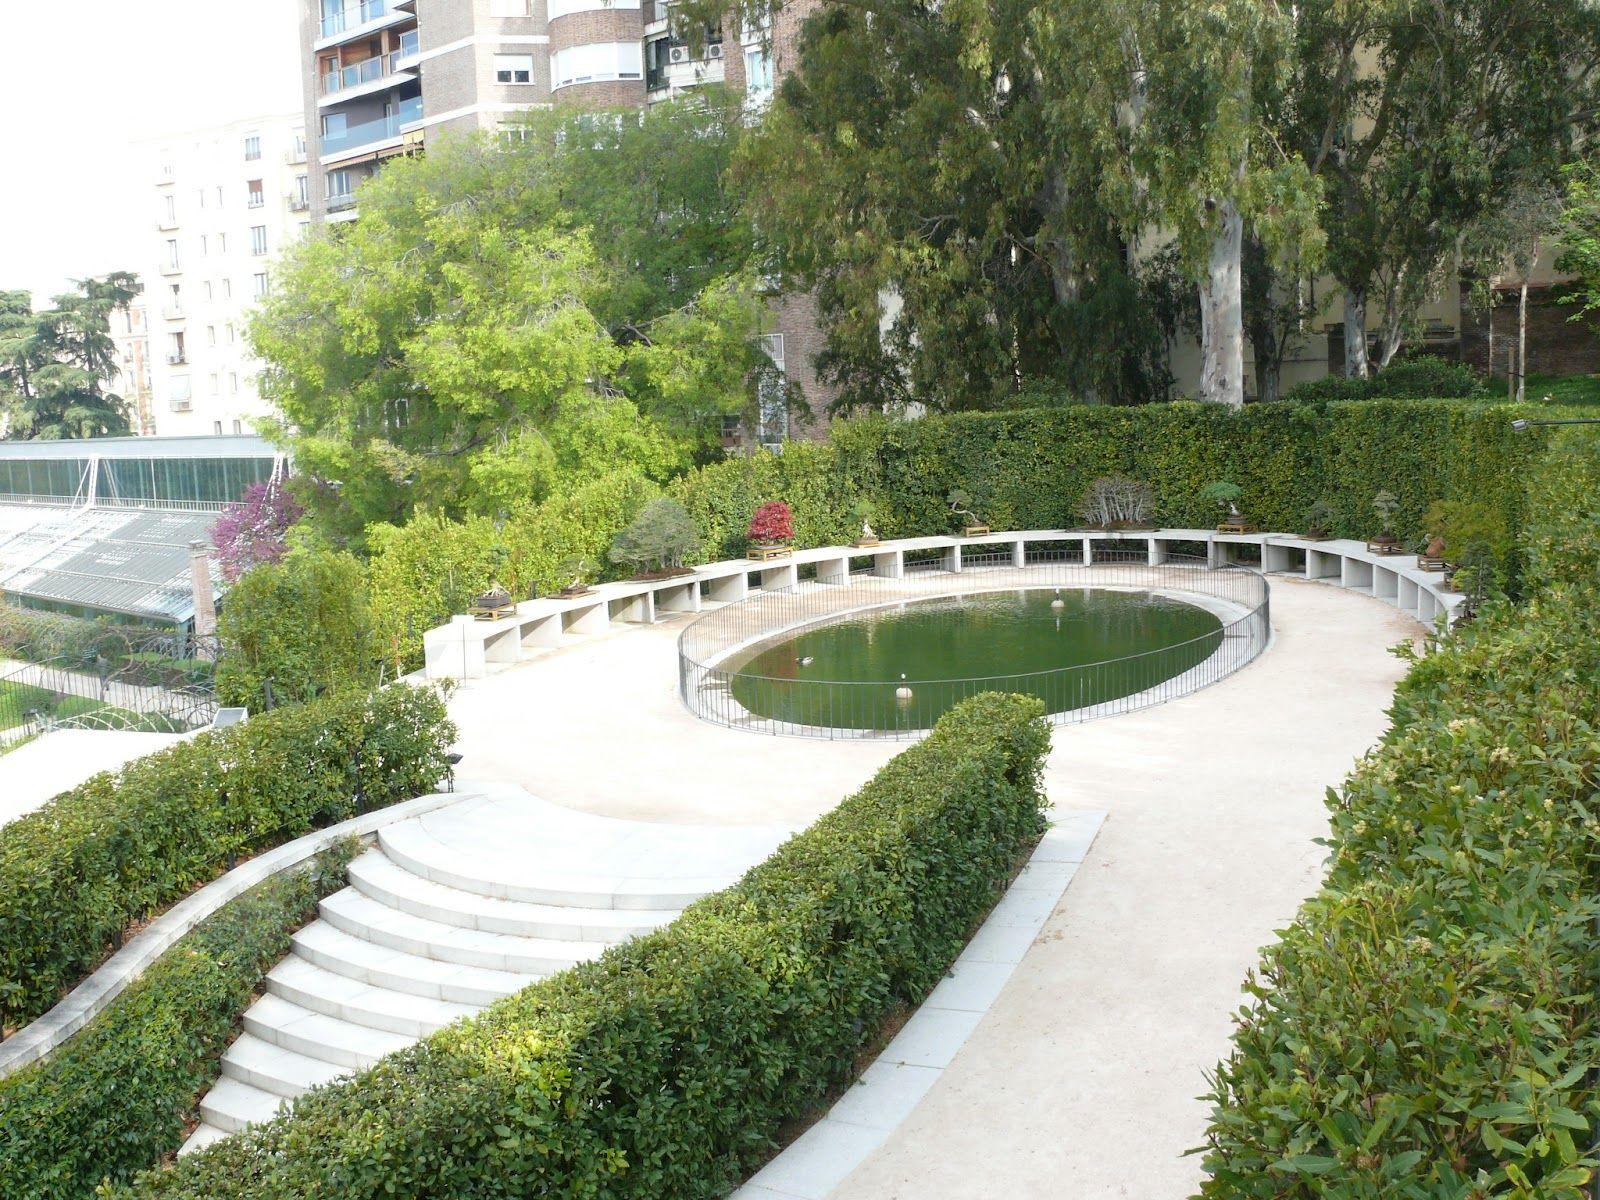 Terraza Alta O De Los Laureles Real Jardin Botanico De Madrid Real Jardin Botanico Jardin Botanico Botanica